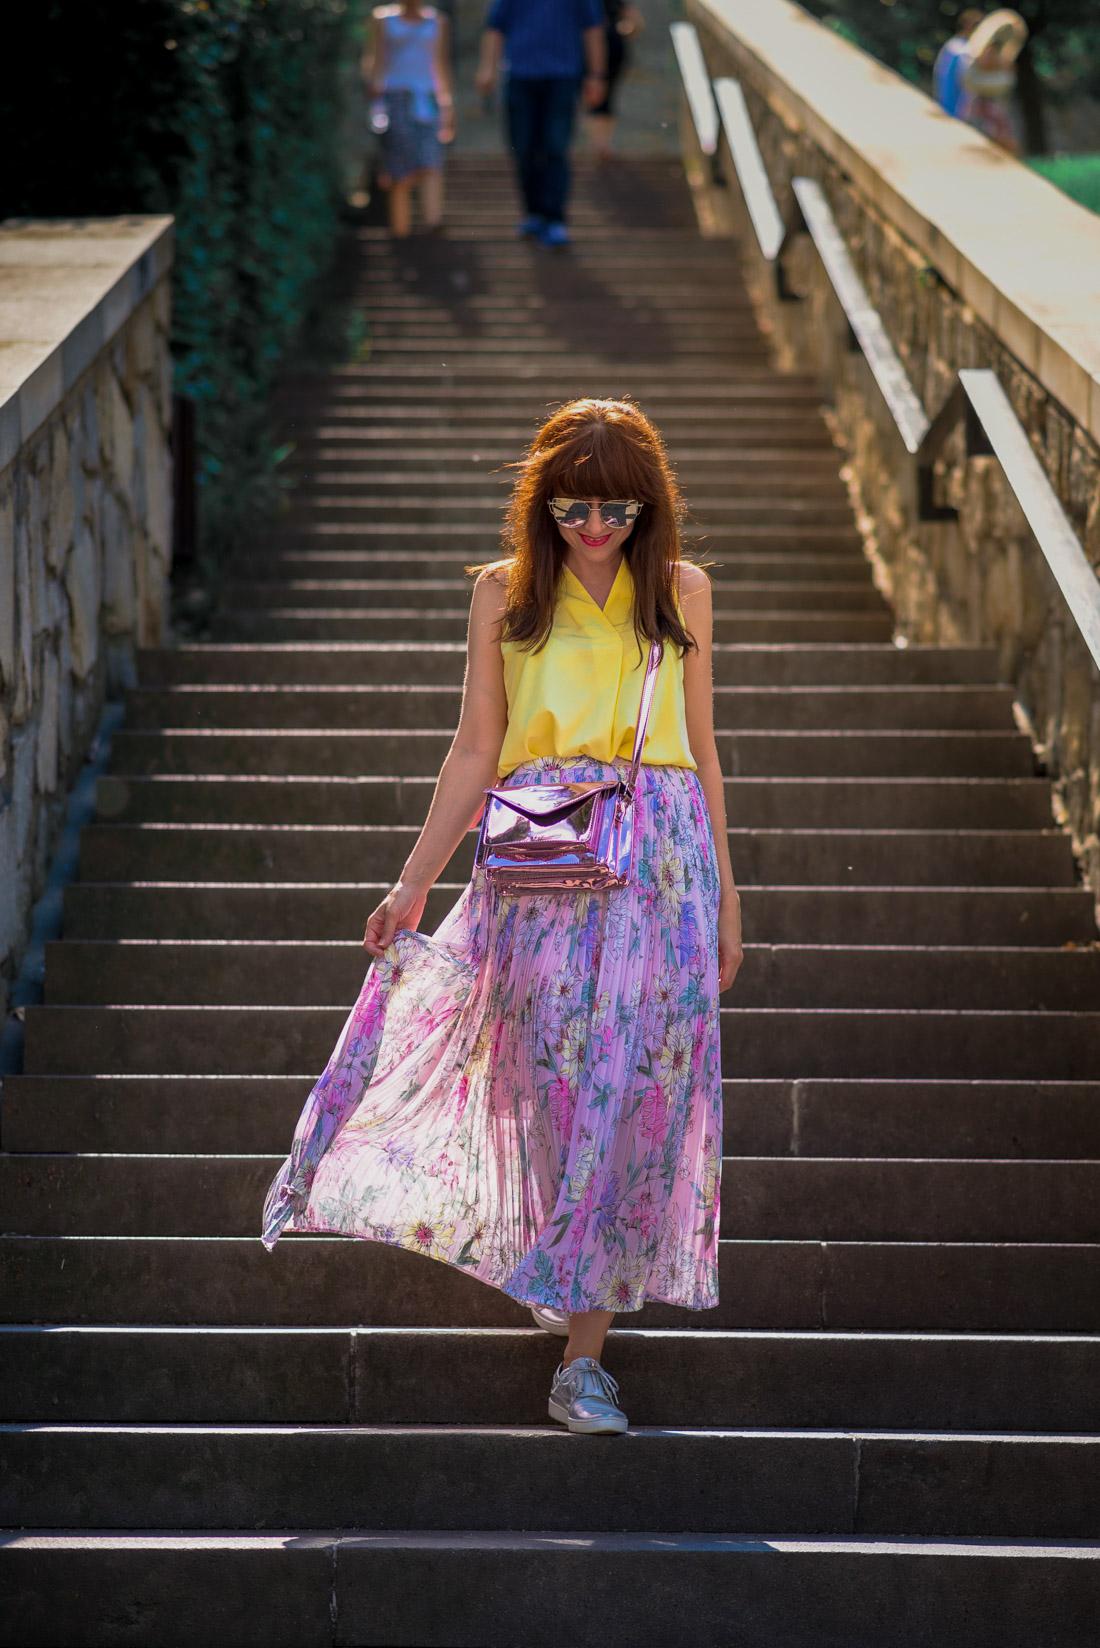 SUKŇA, KTORÁ VÁM VYRAZÍ DYCH_Katharine-fashion is beautiful_blog 11_Kvetinová plisovaná sukňa_Pastelové farby_Kabelka od Answear_Katarína Jakubčová_Fashion blogerka